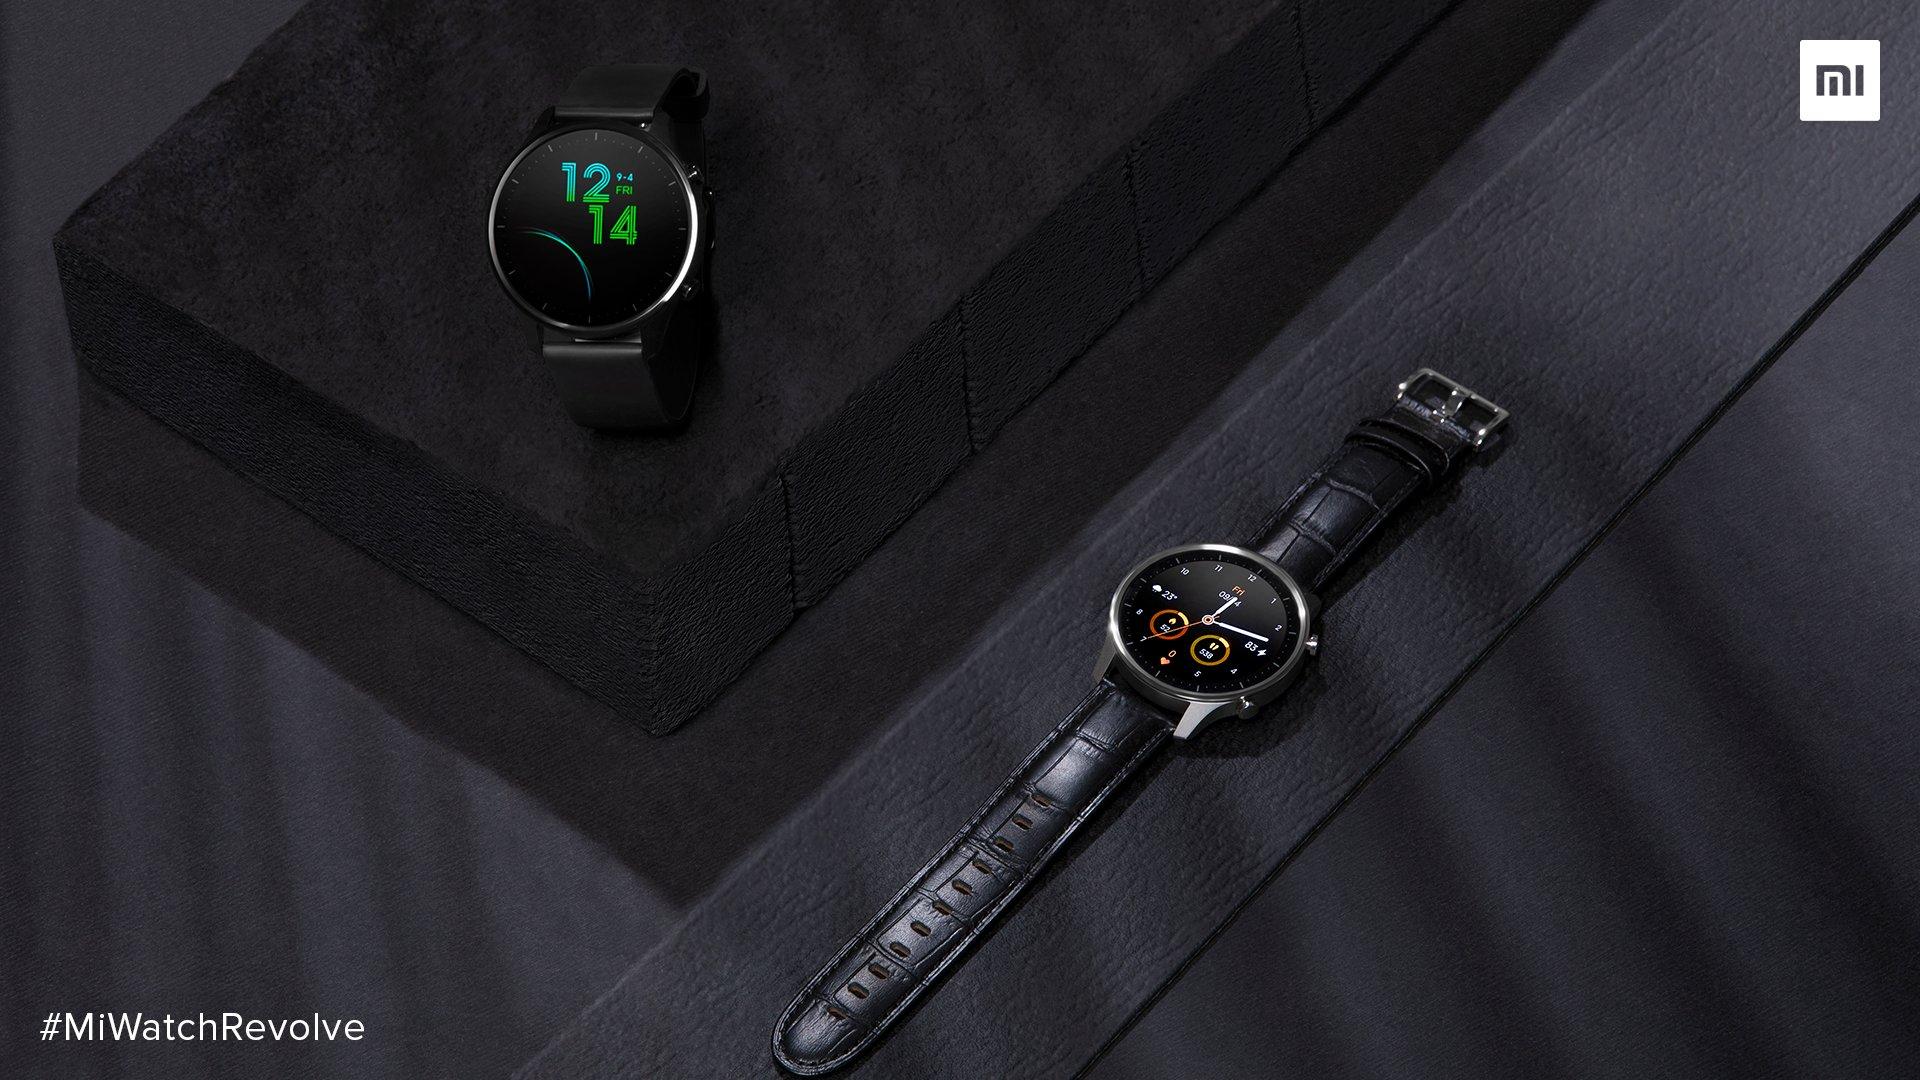 Смарт-часы Xiaomi Mi Watch Revolve